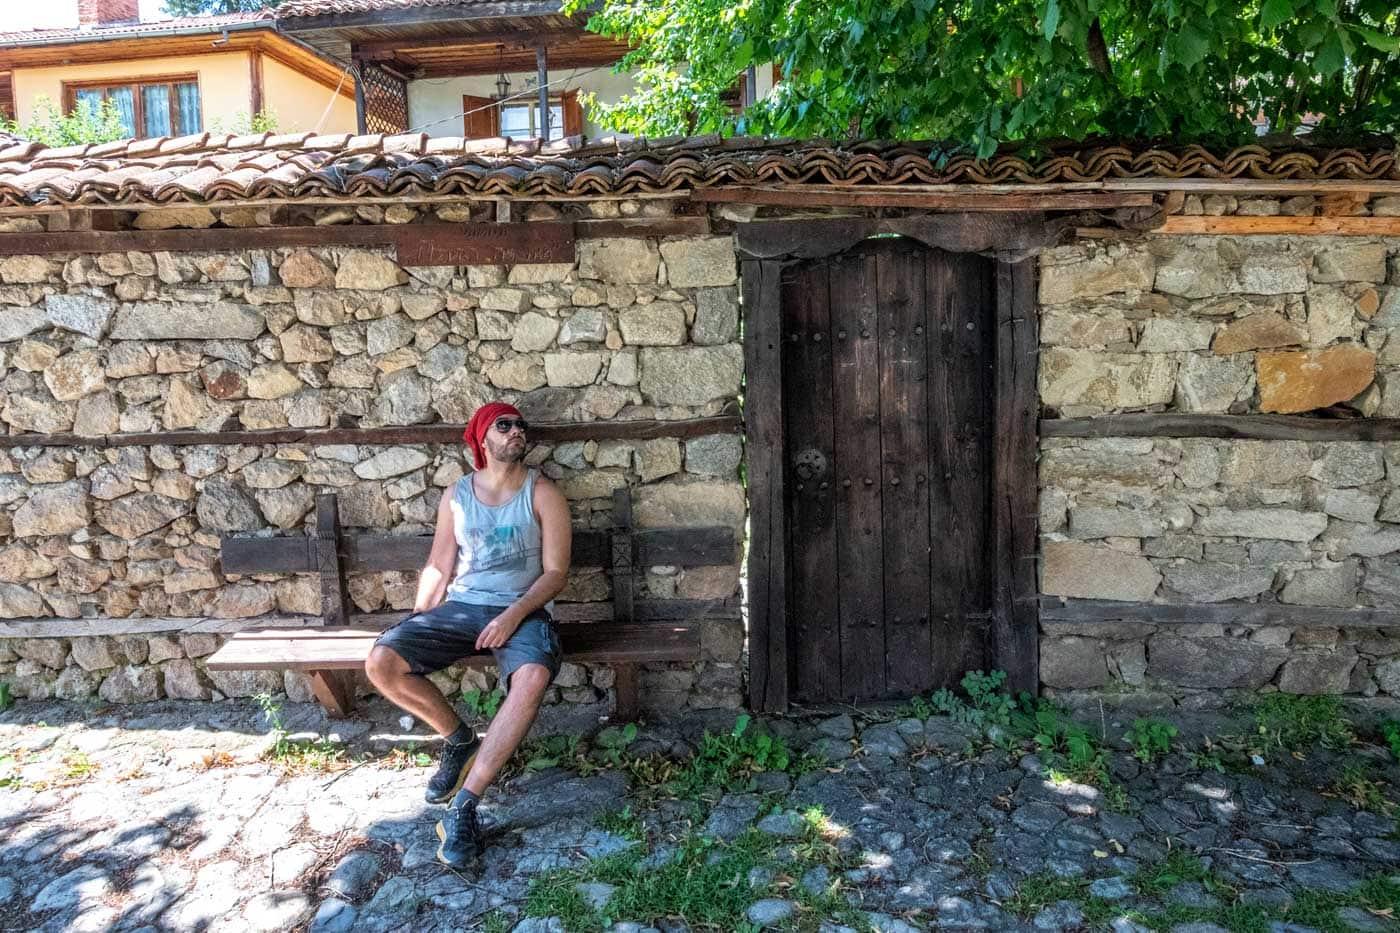 where is koprivshtitsa - small town of big heroes